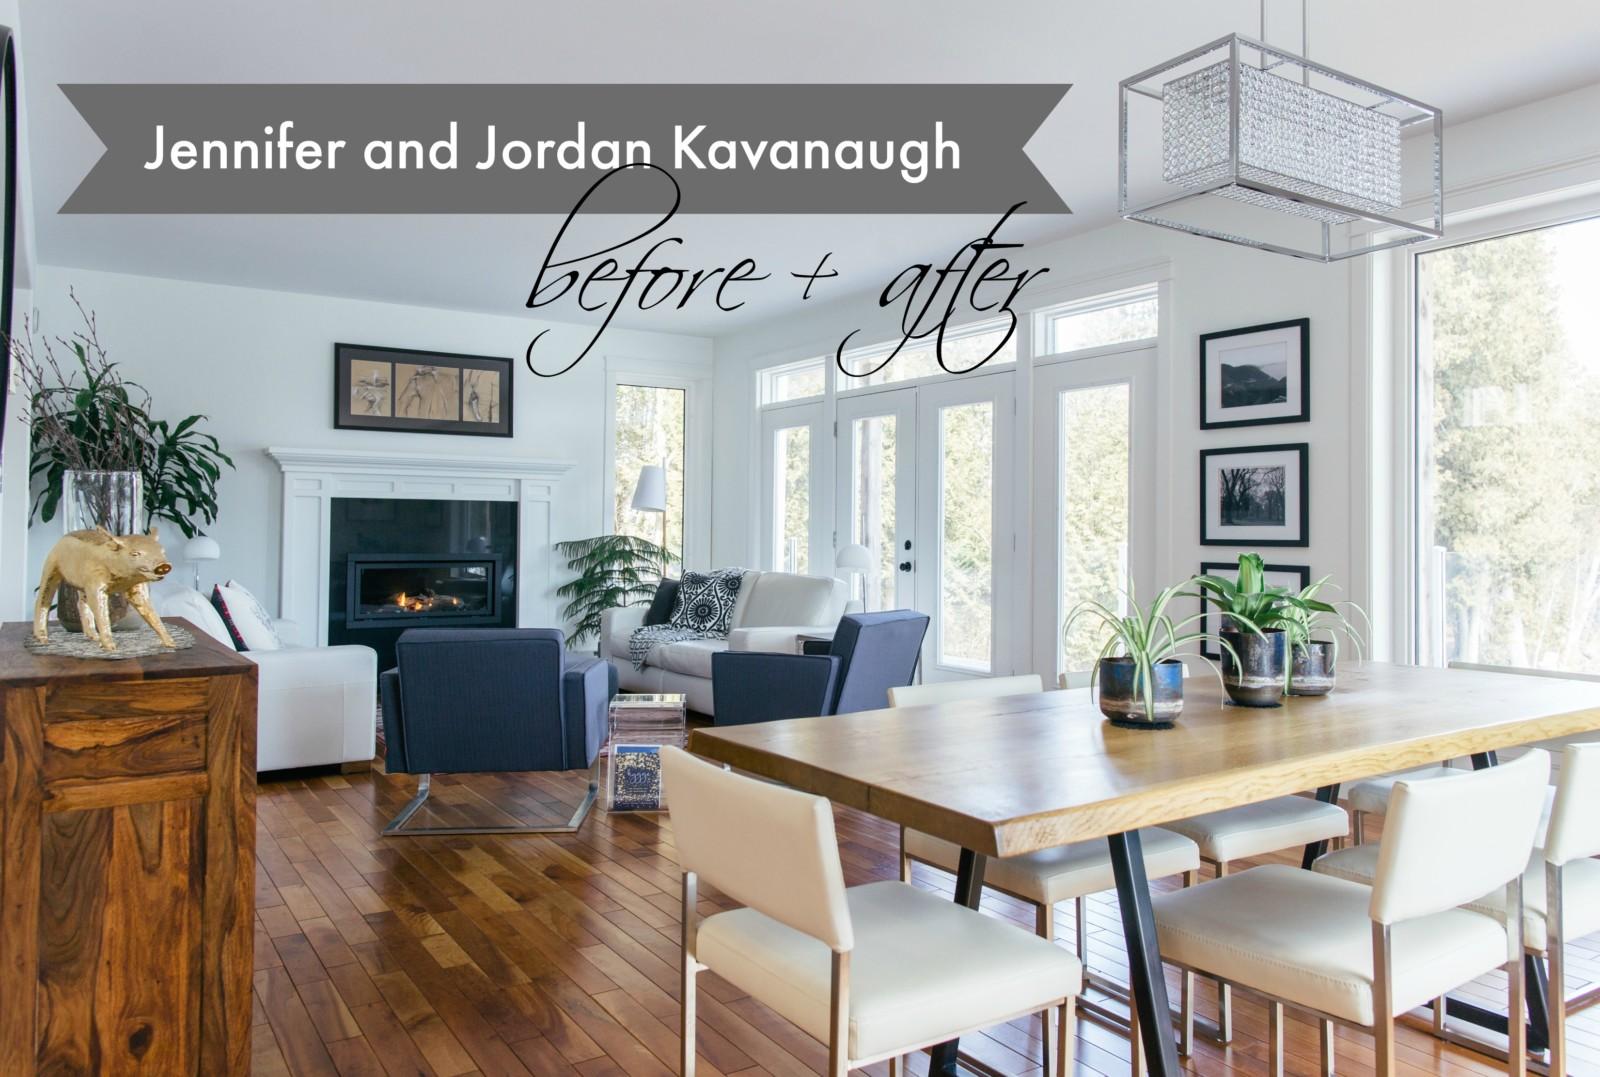 Jennifer And Jordan Kavanaugh Residence This Riverfront Property Is